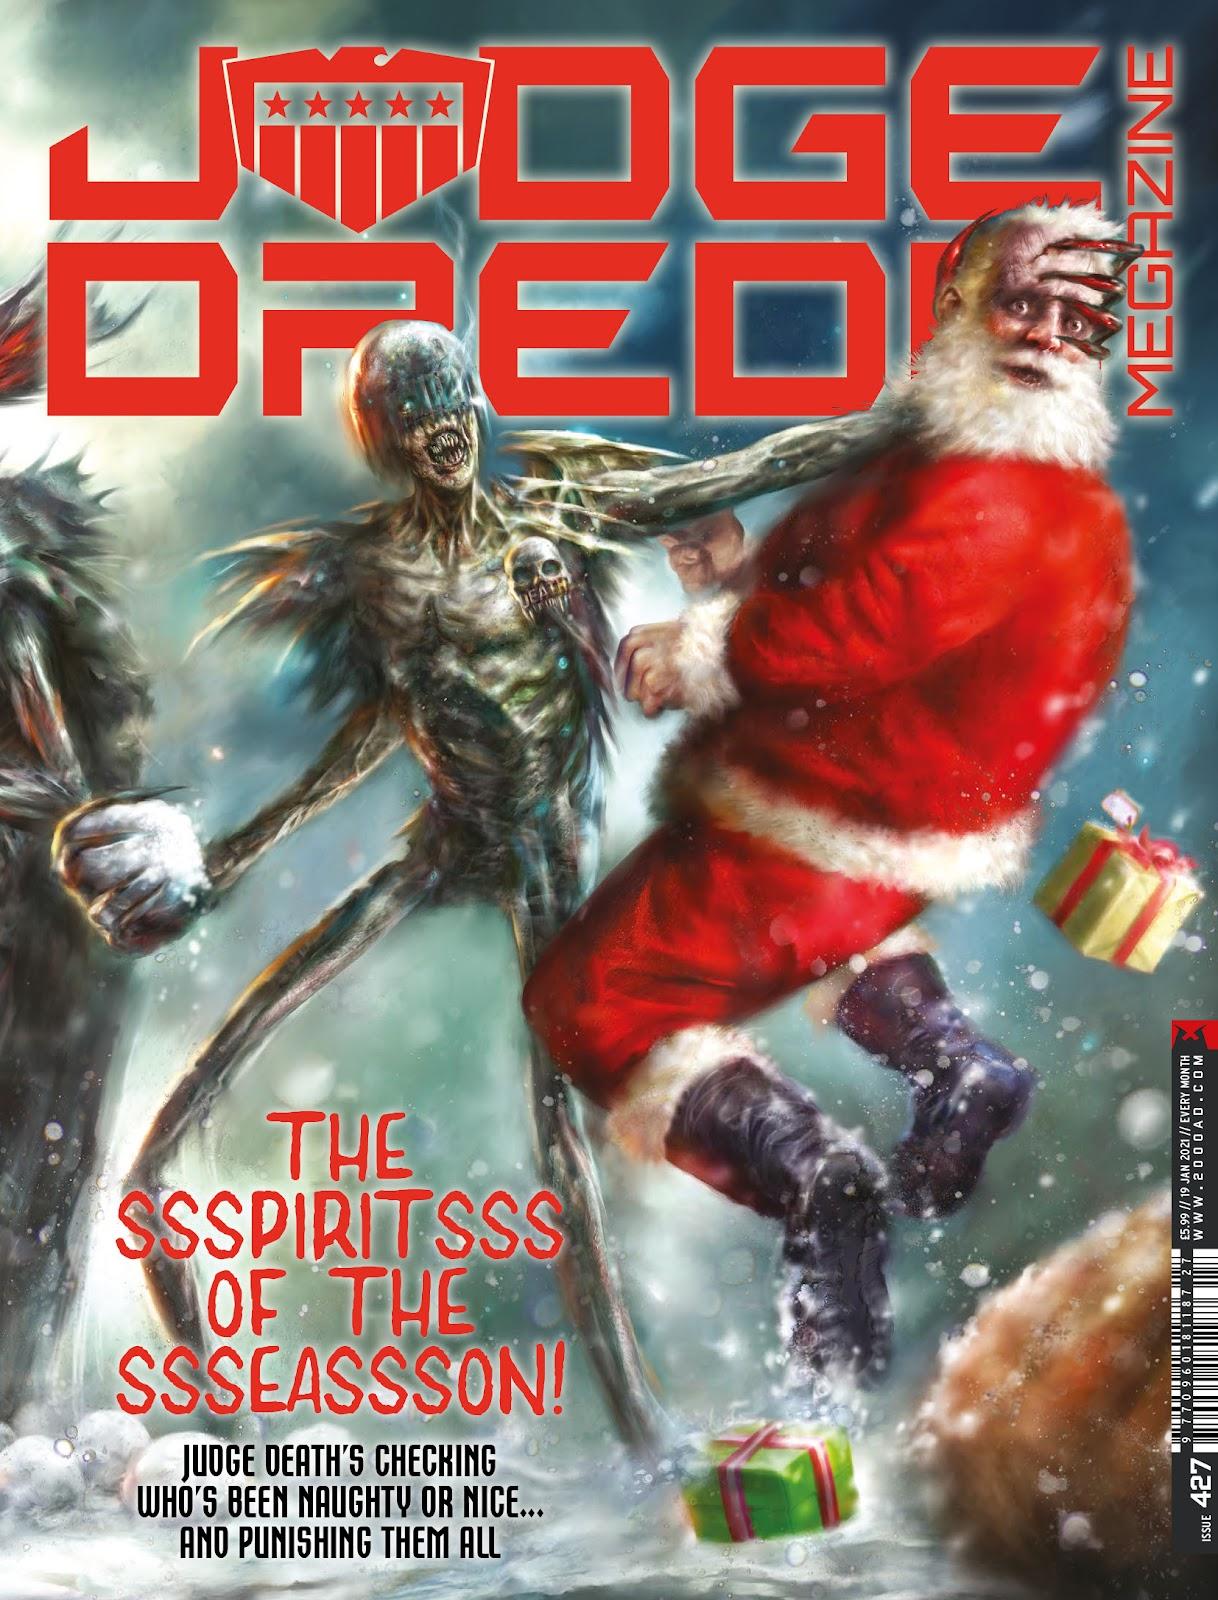 Judge Dredd Megazine (Vol. 5) issue 427 - Page 1